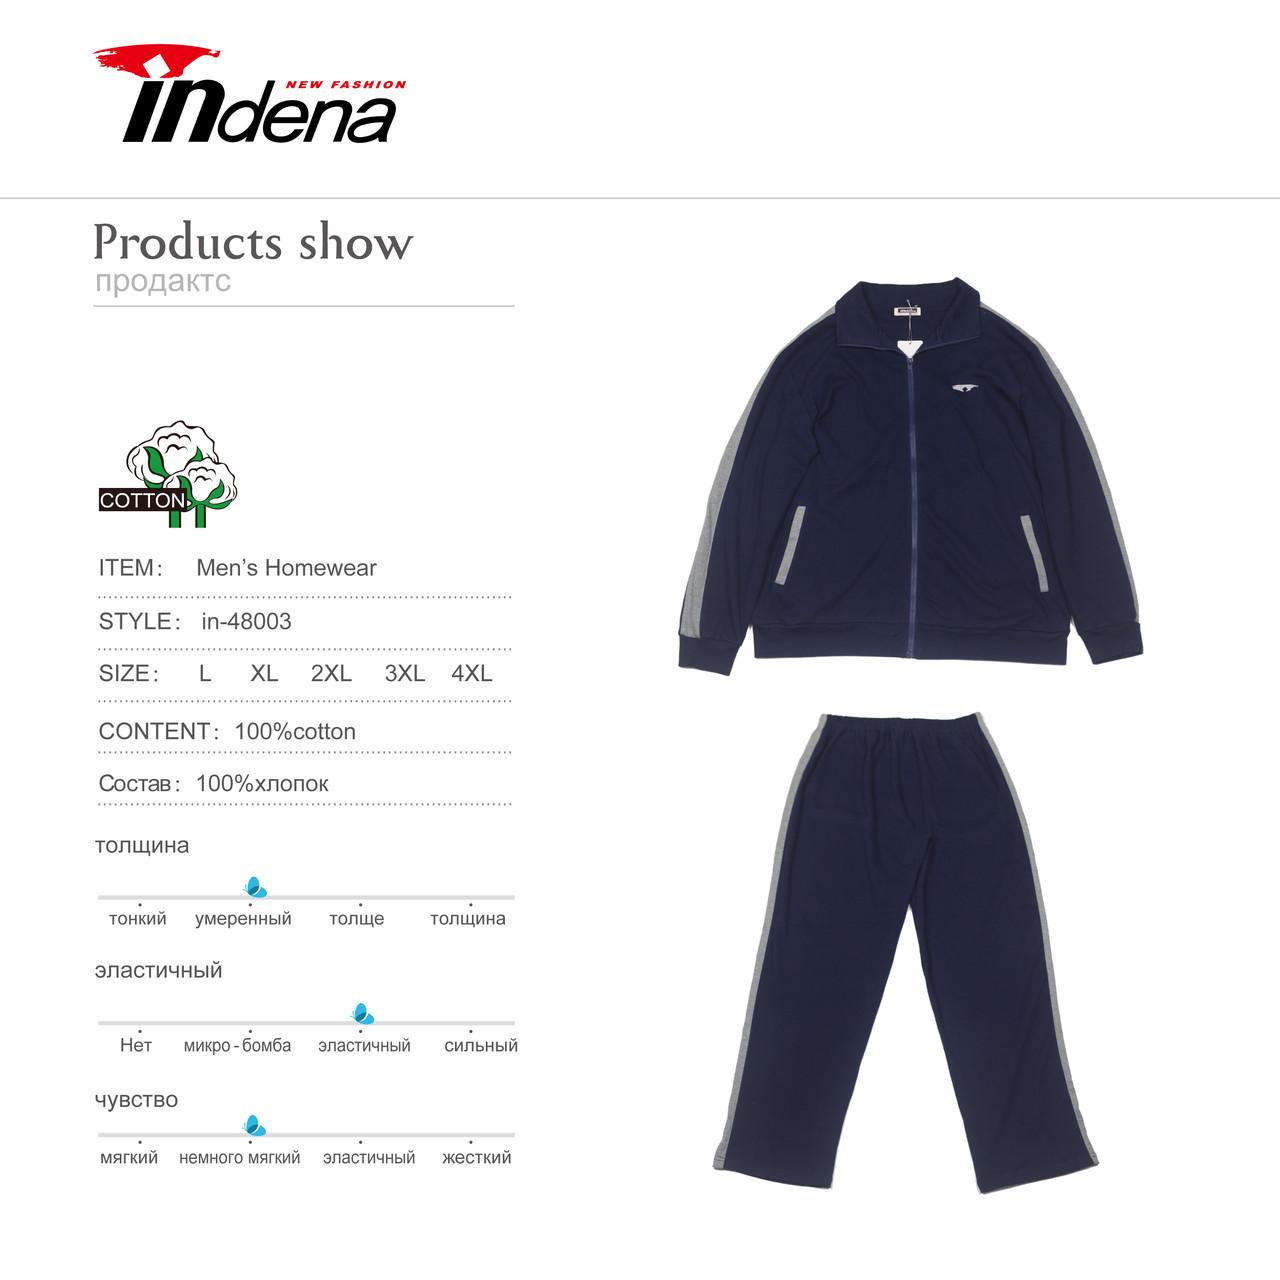 Мужская домашняя одежда Марка «INDENA»   Арт.48003